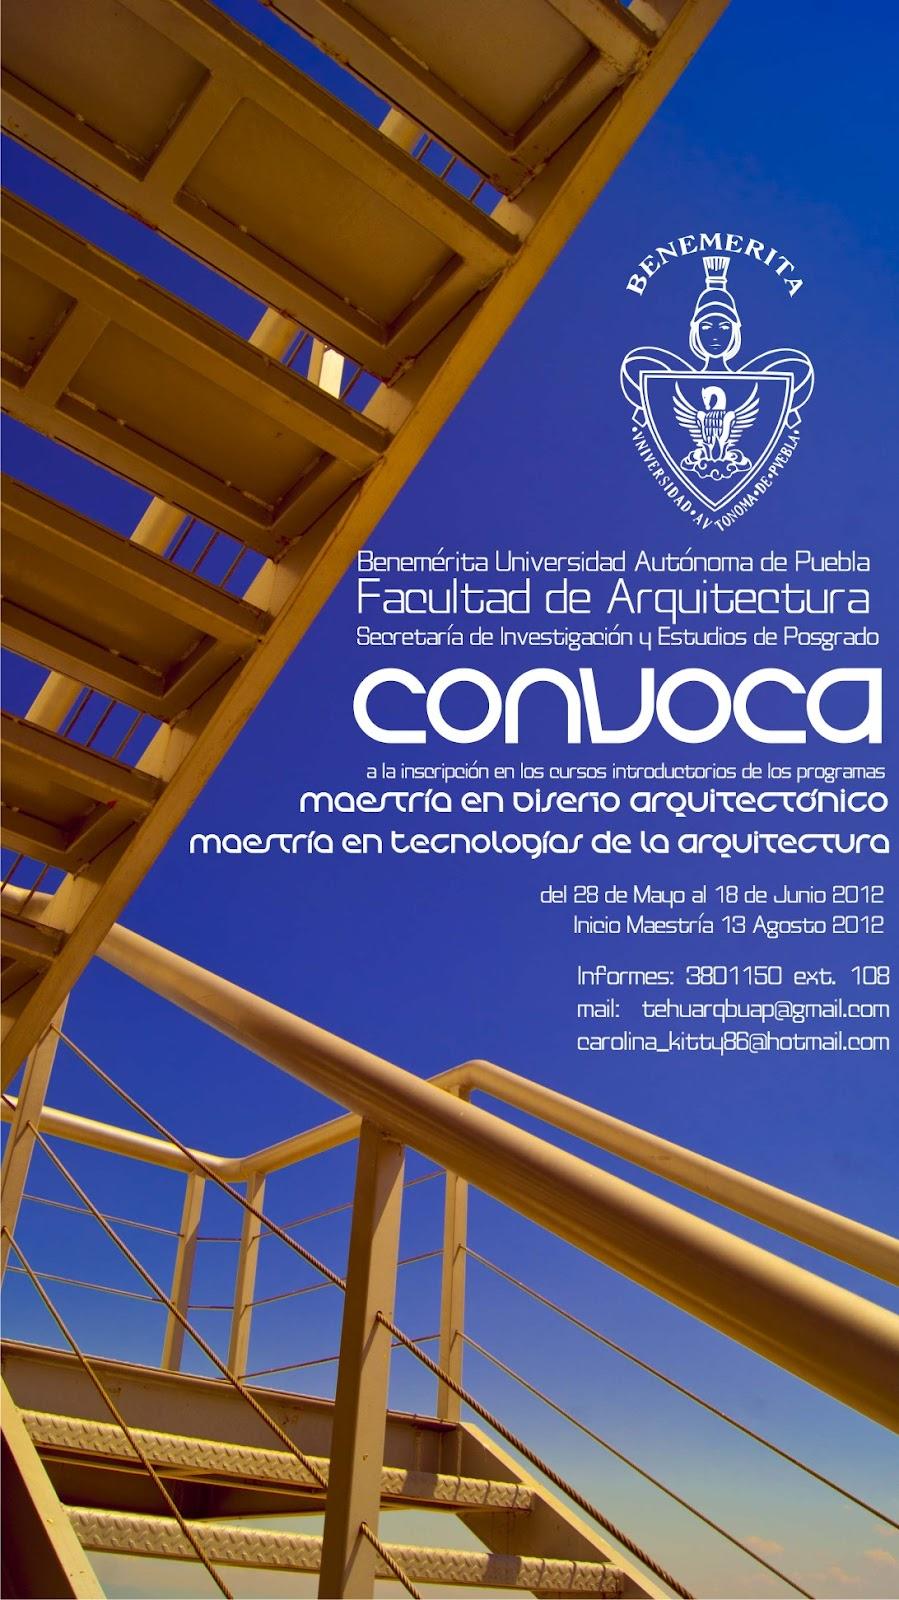 Arquitectura buap tehuacan abril 2012 for Arquitectura 5 de mayo plan de estudios